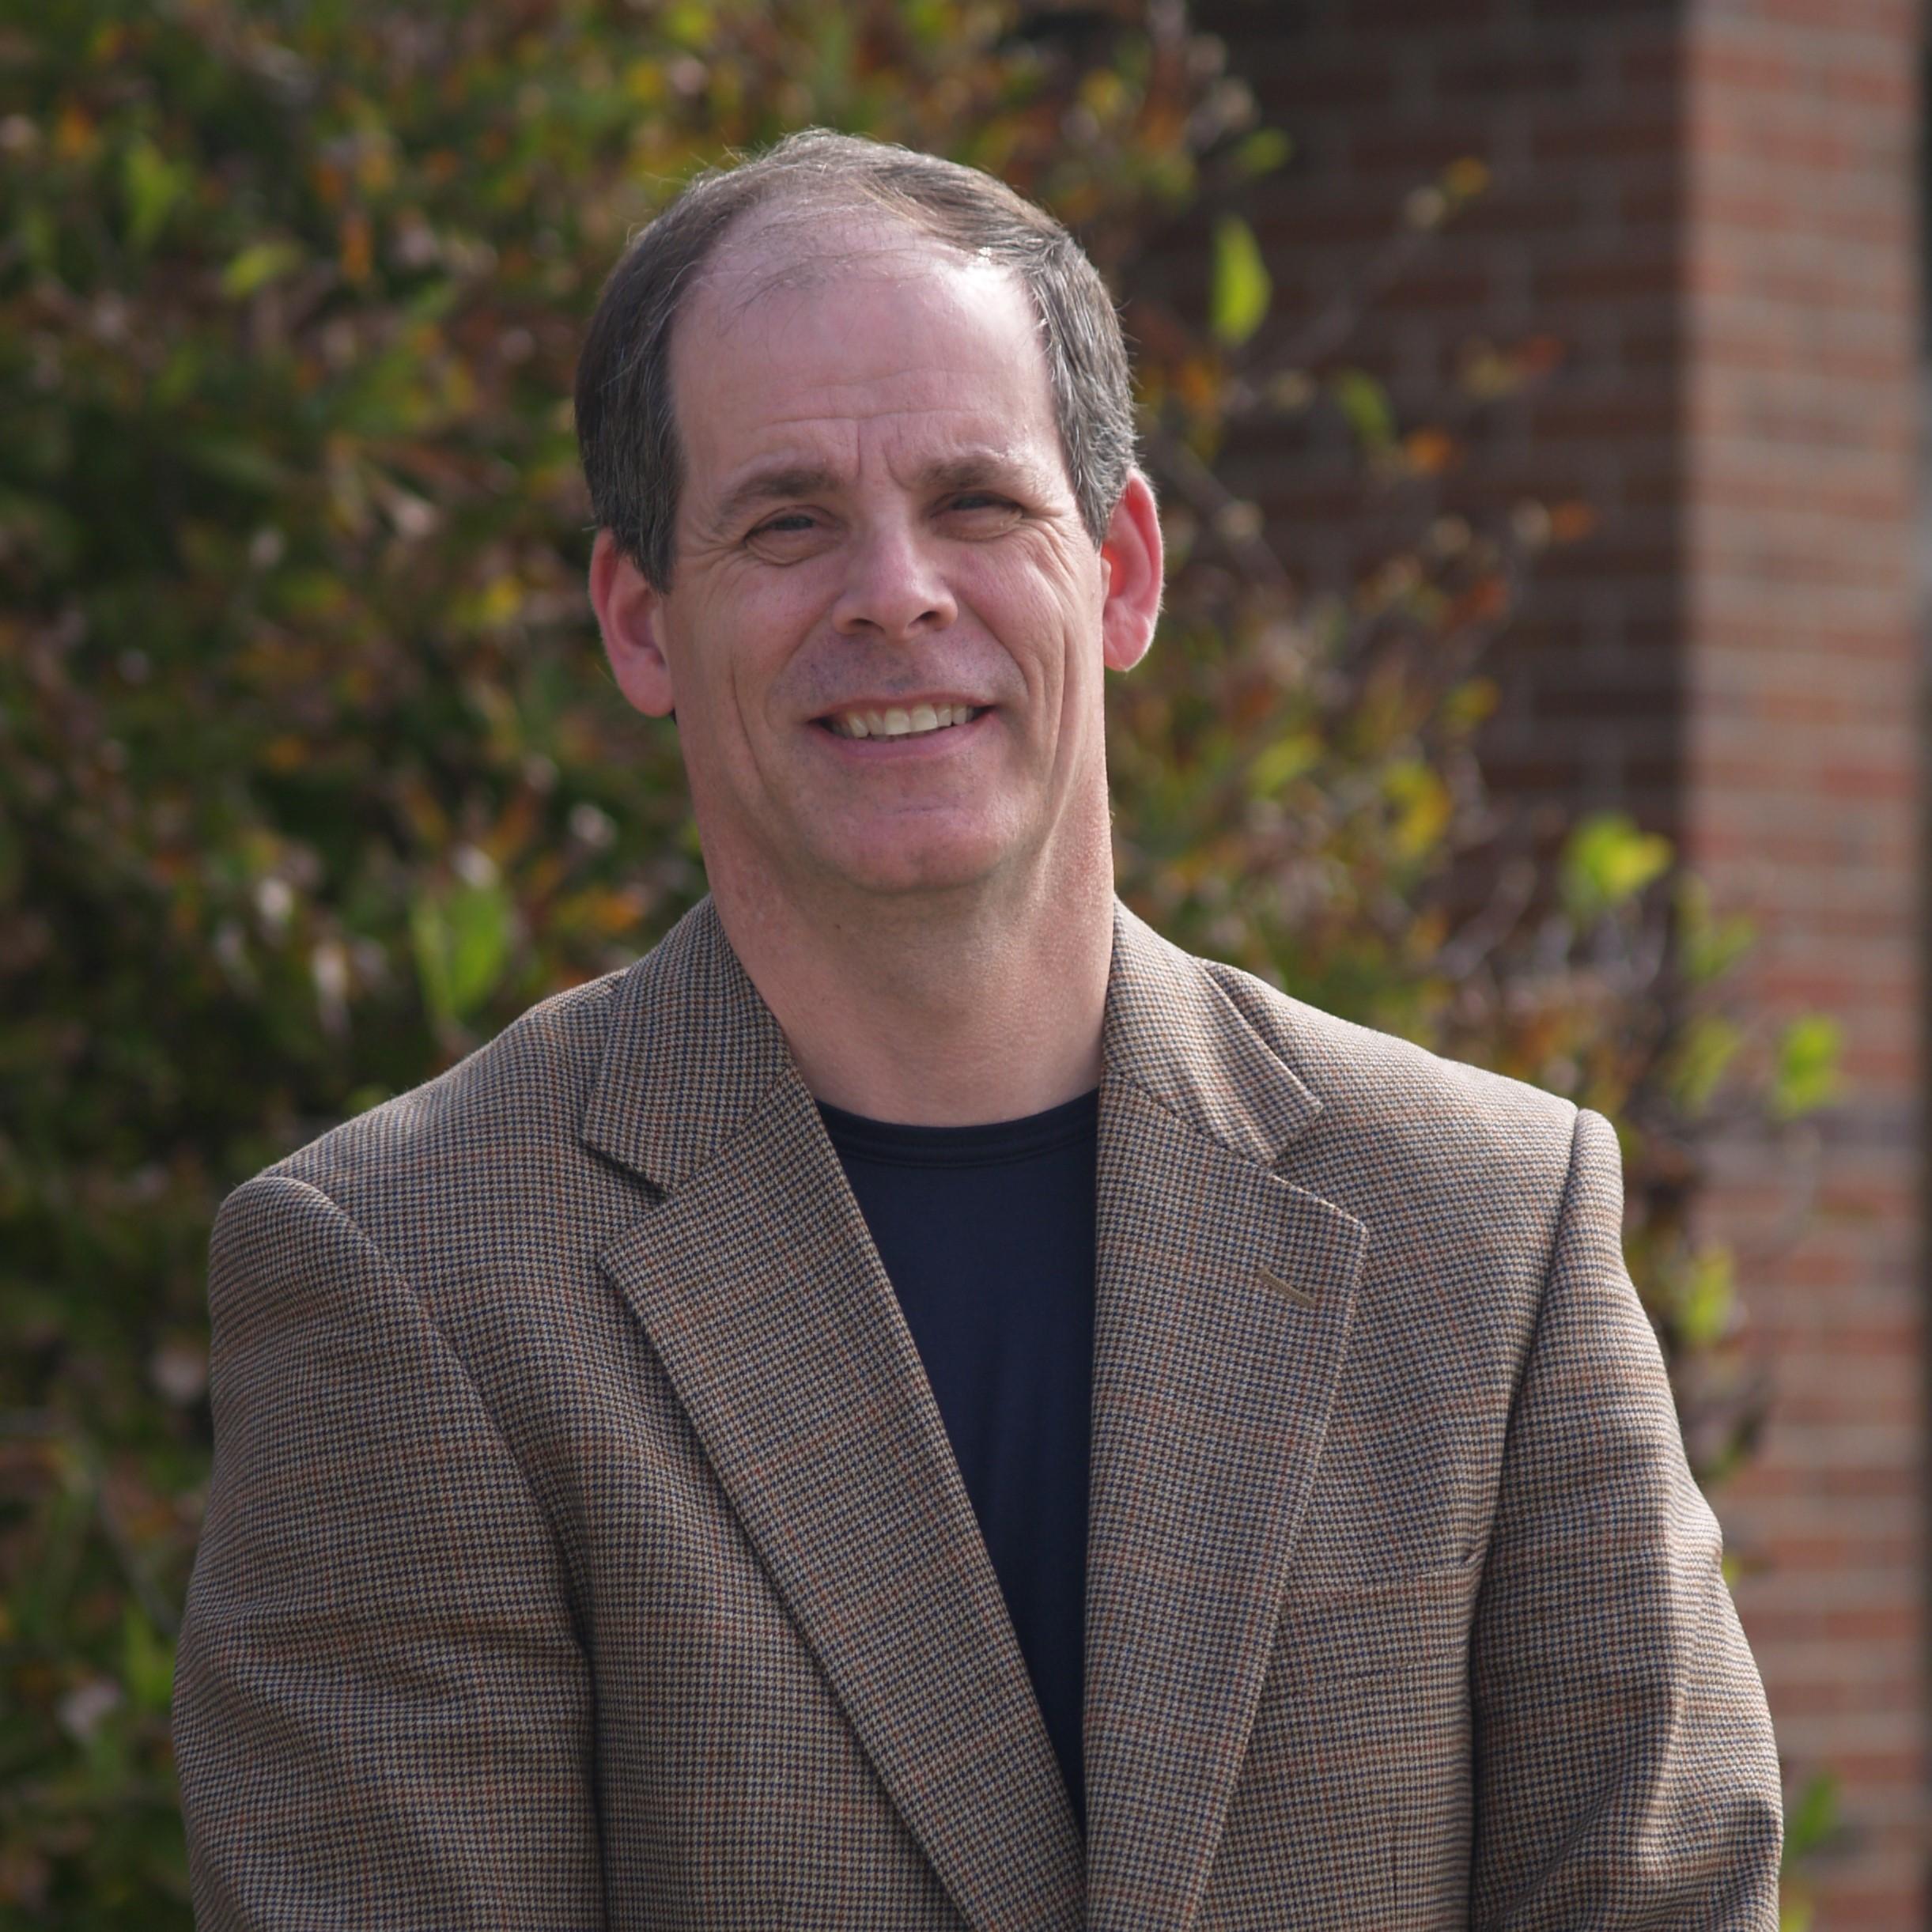 James Kuhn